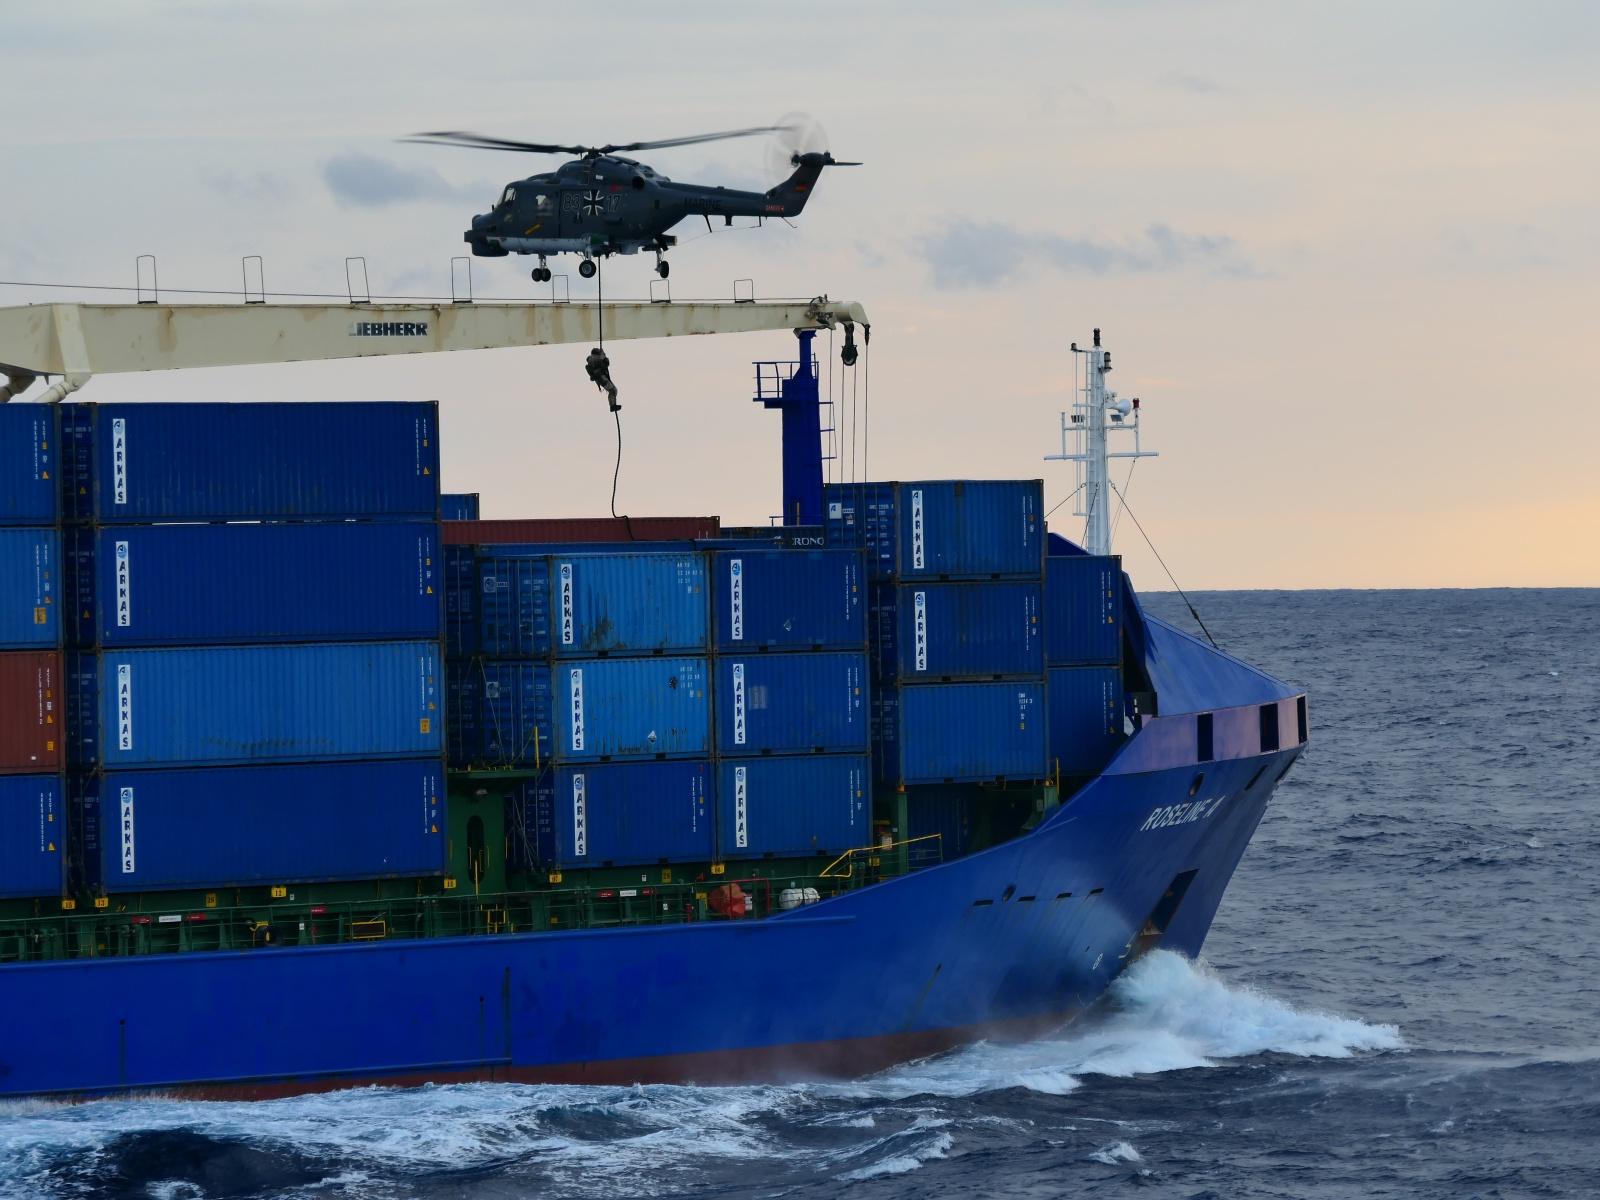 Libya: Operation IRINI inspected a Turkish-flagged vessel